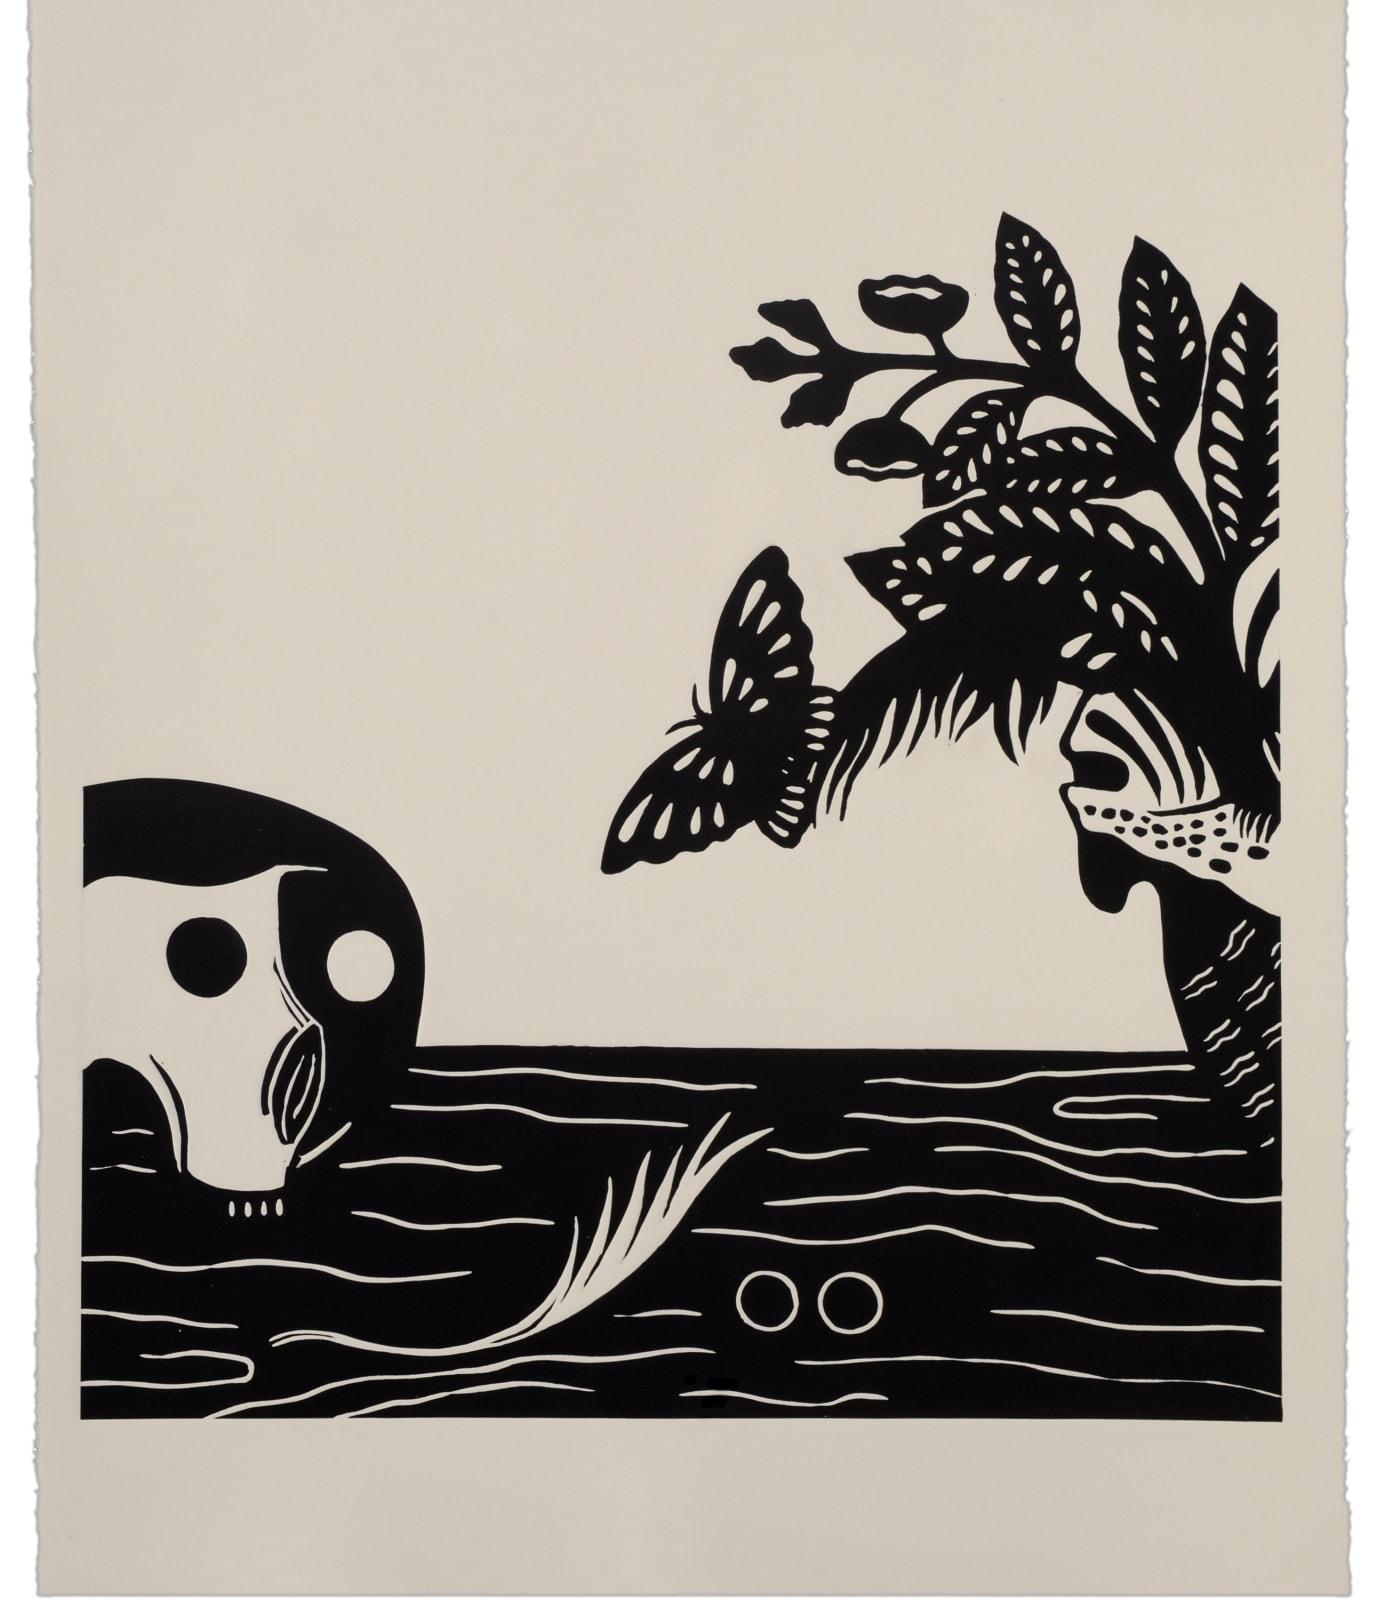 Jorge Nesbitt Untitled, 2018